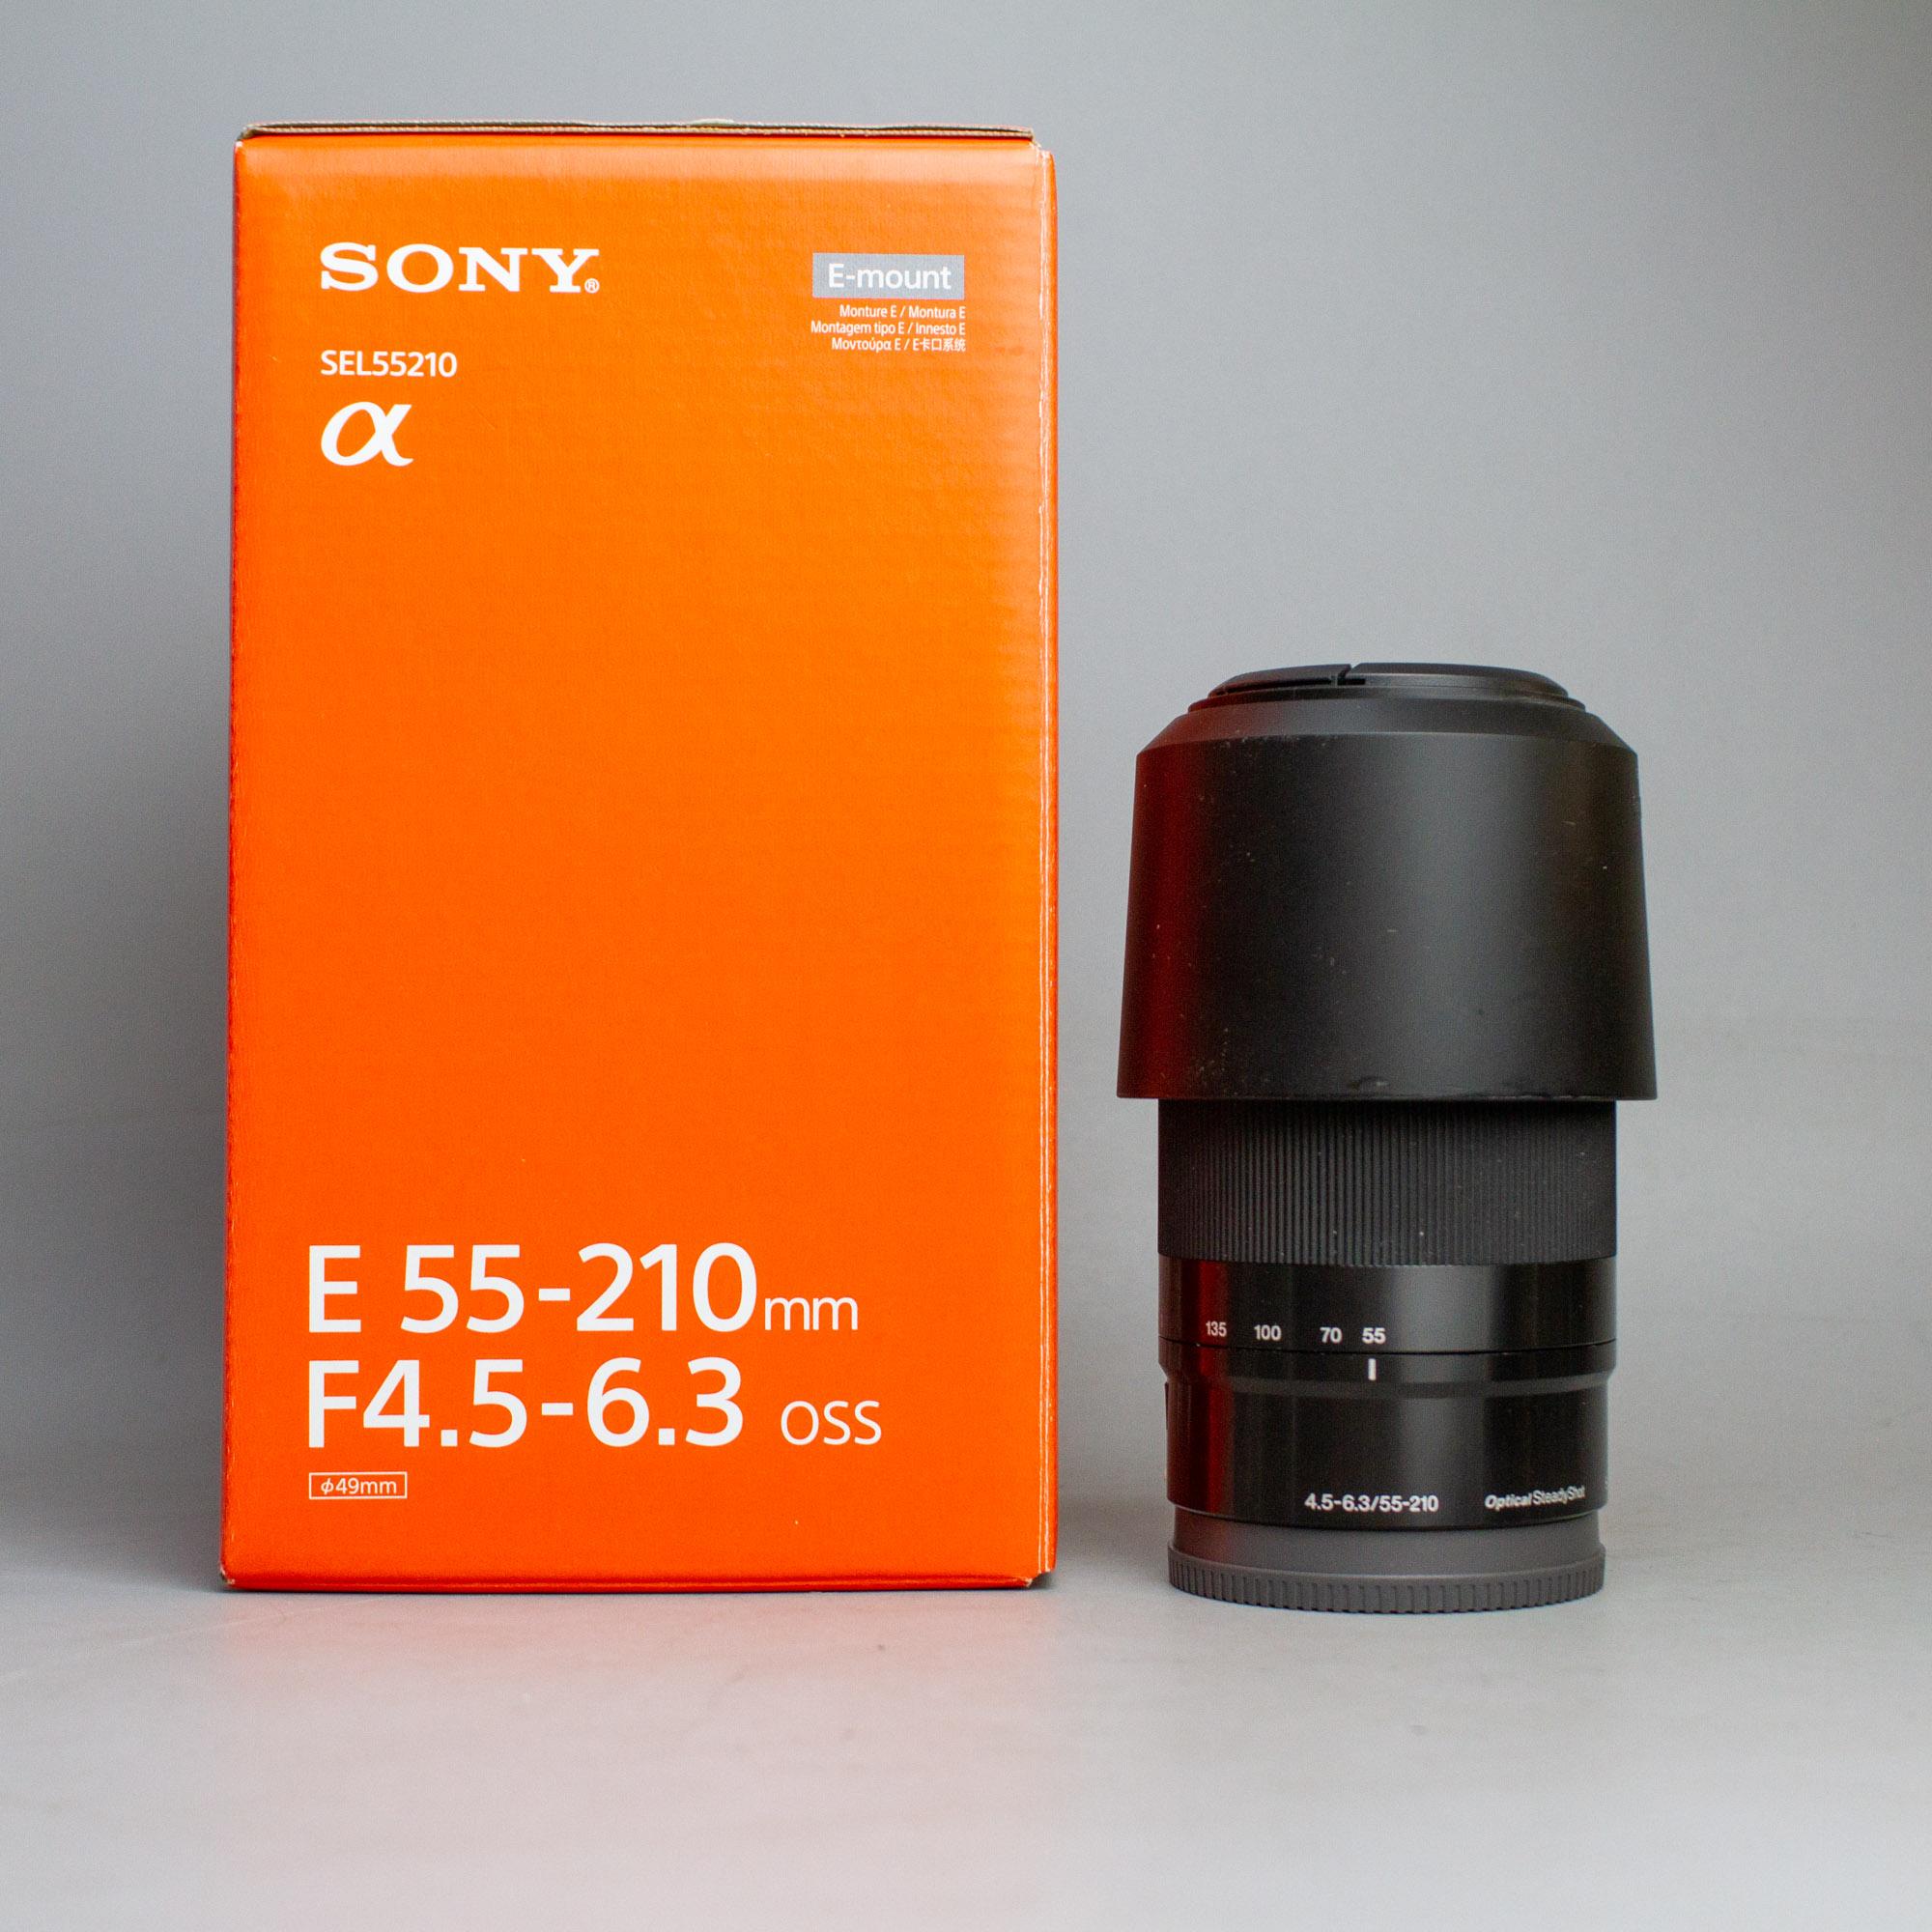 sony-55-210mm-f4-5-6-3-sel-af-oss-fb-55-210-18810